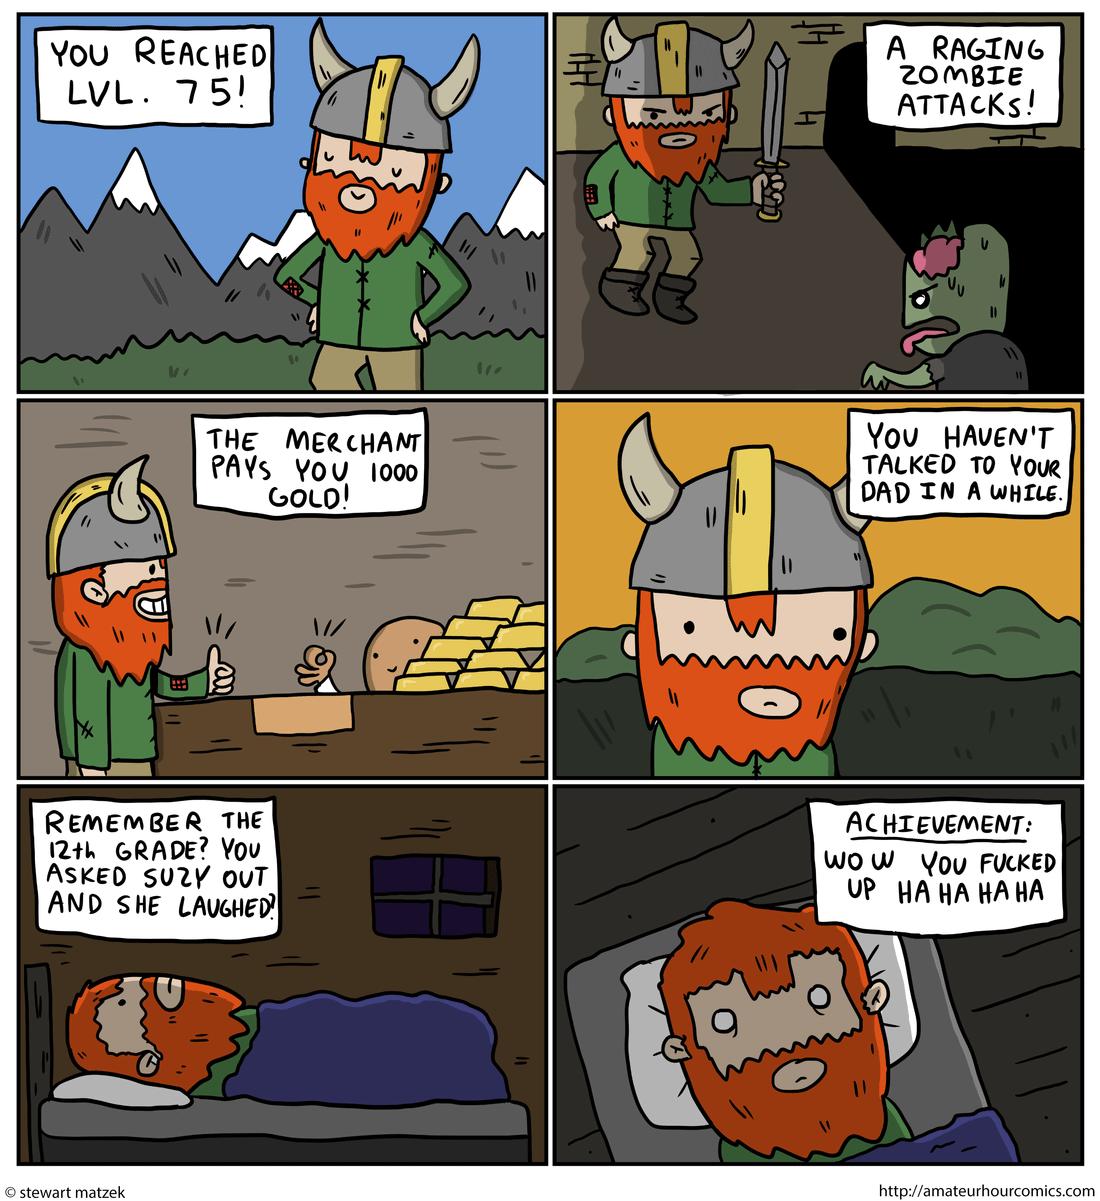 Achievements of Life